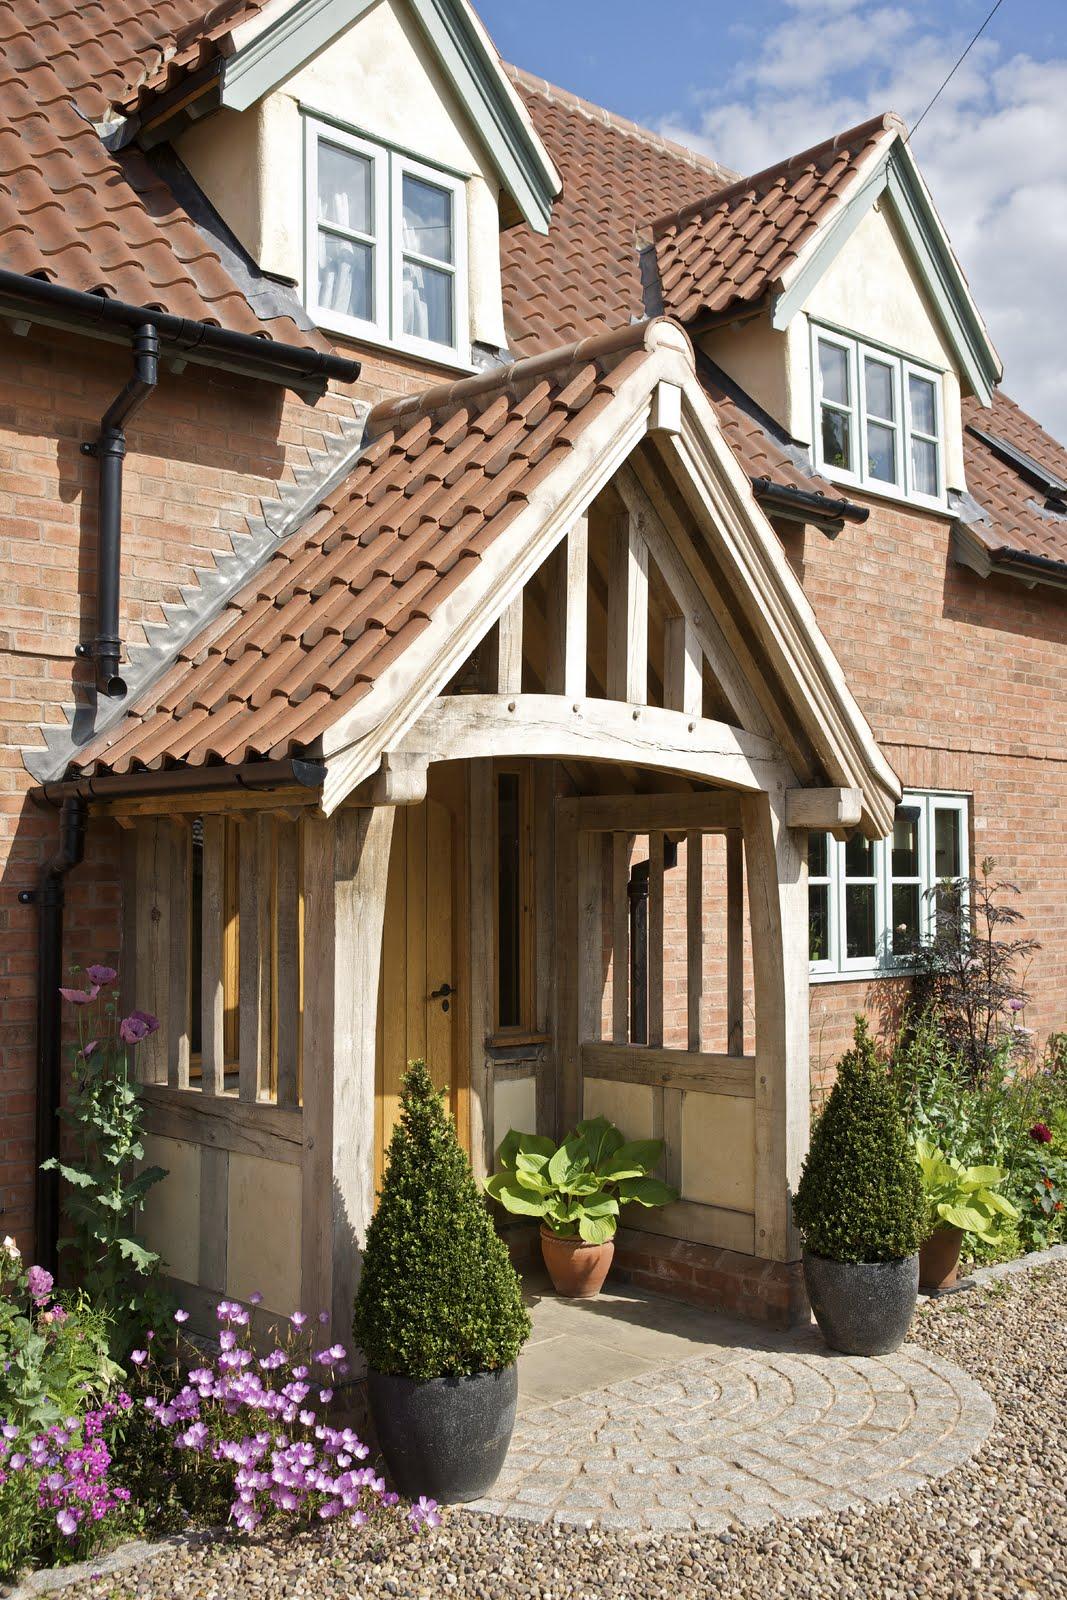 Design Front Porches And House Exterior Design: Front Porch Designs Uk - Google Search